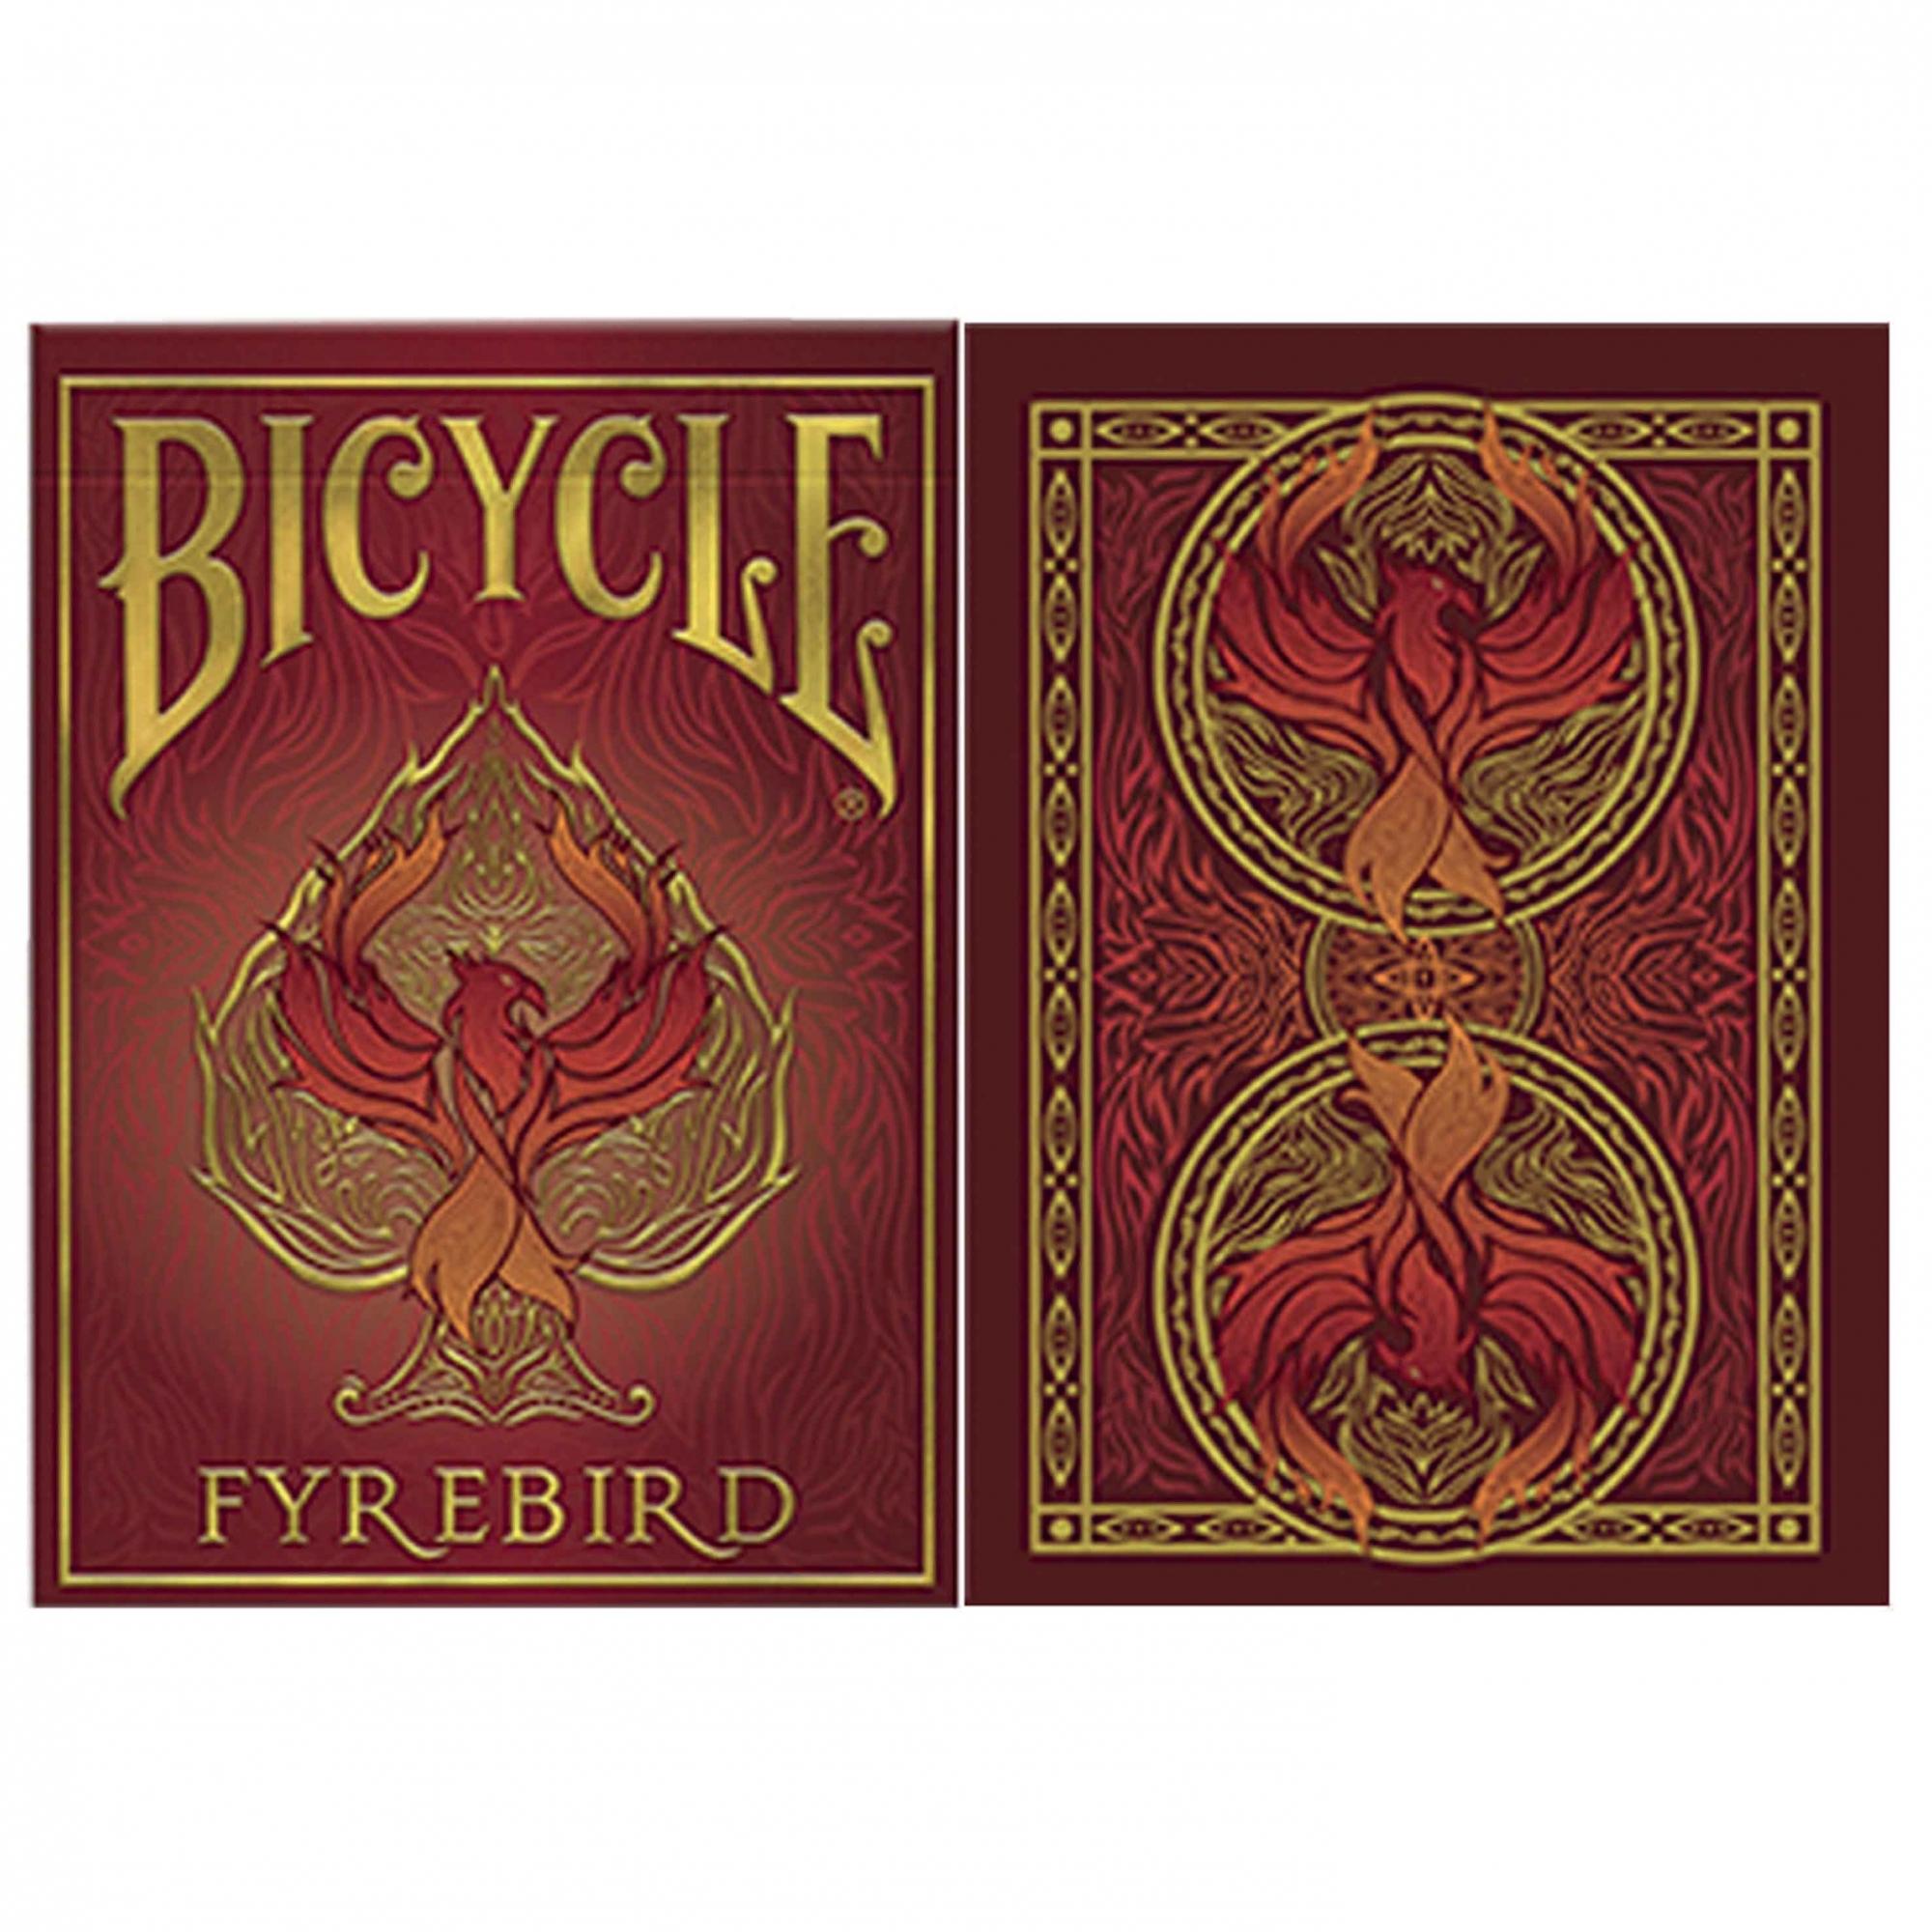 Baralho Bicycle Fyrebird - Premium Deck (Lançamento)